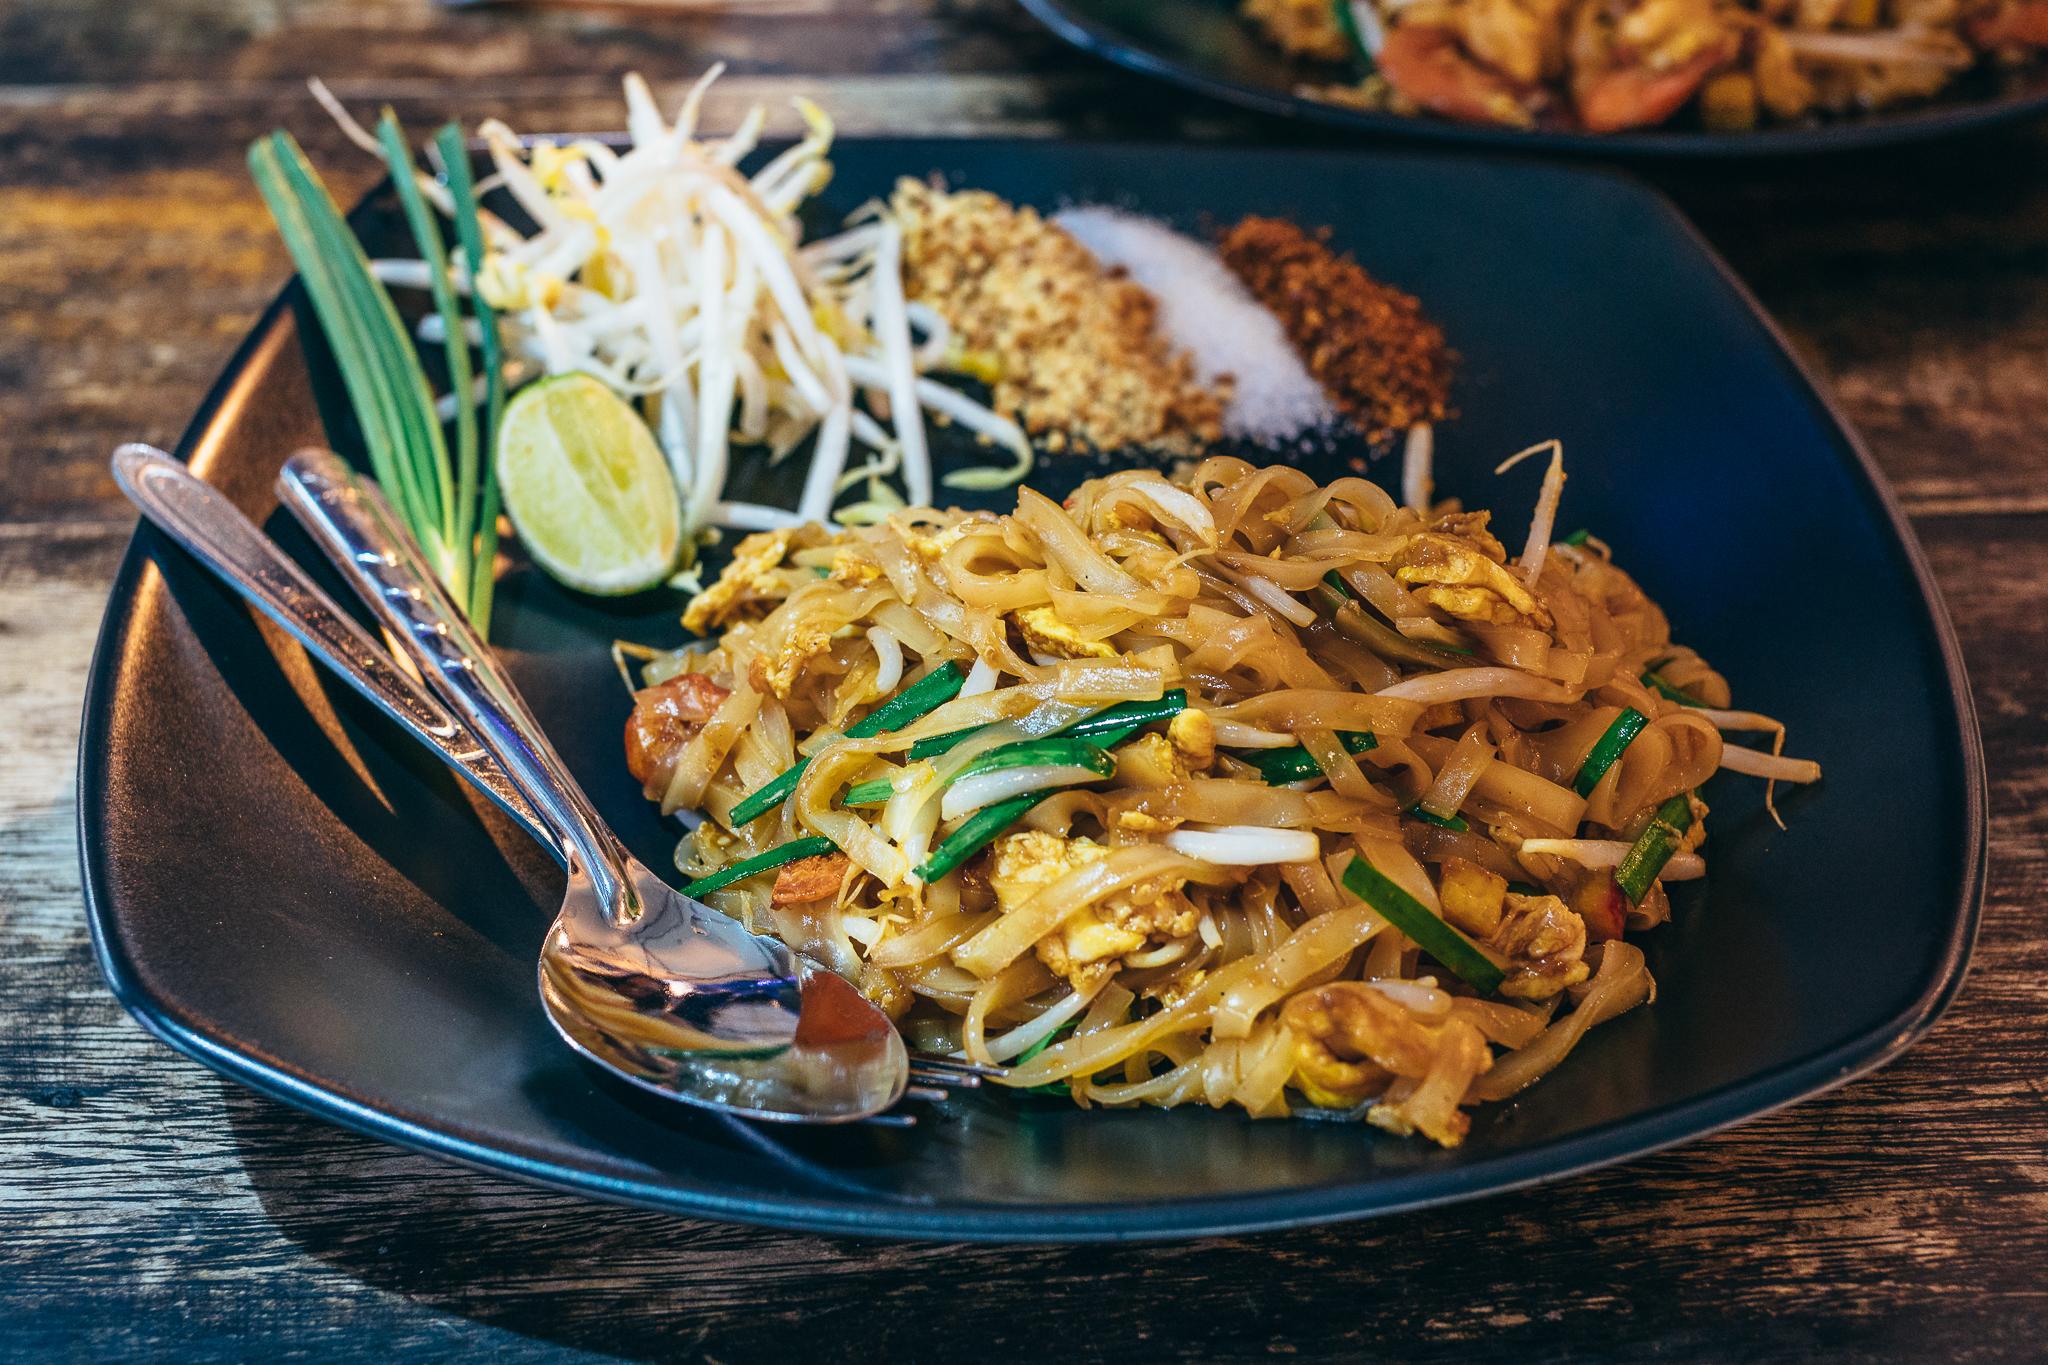 Favorite: Pad Thai